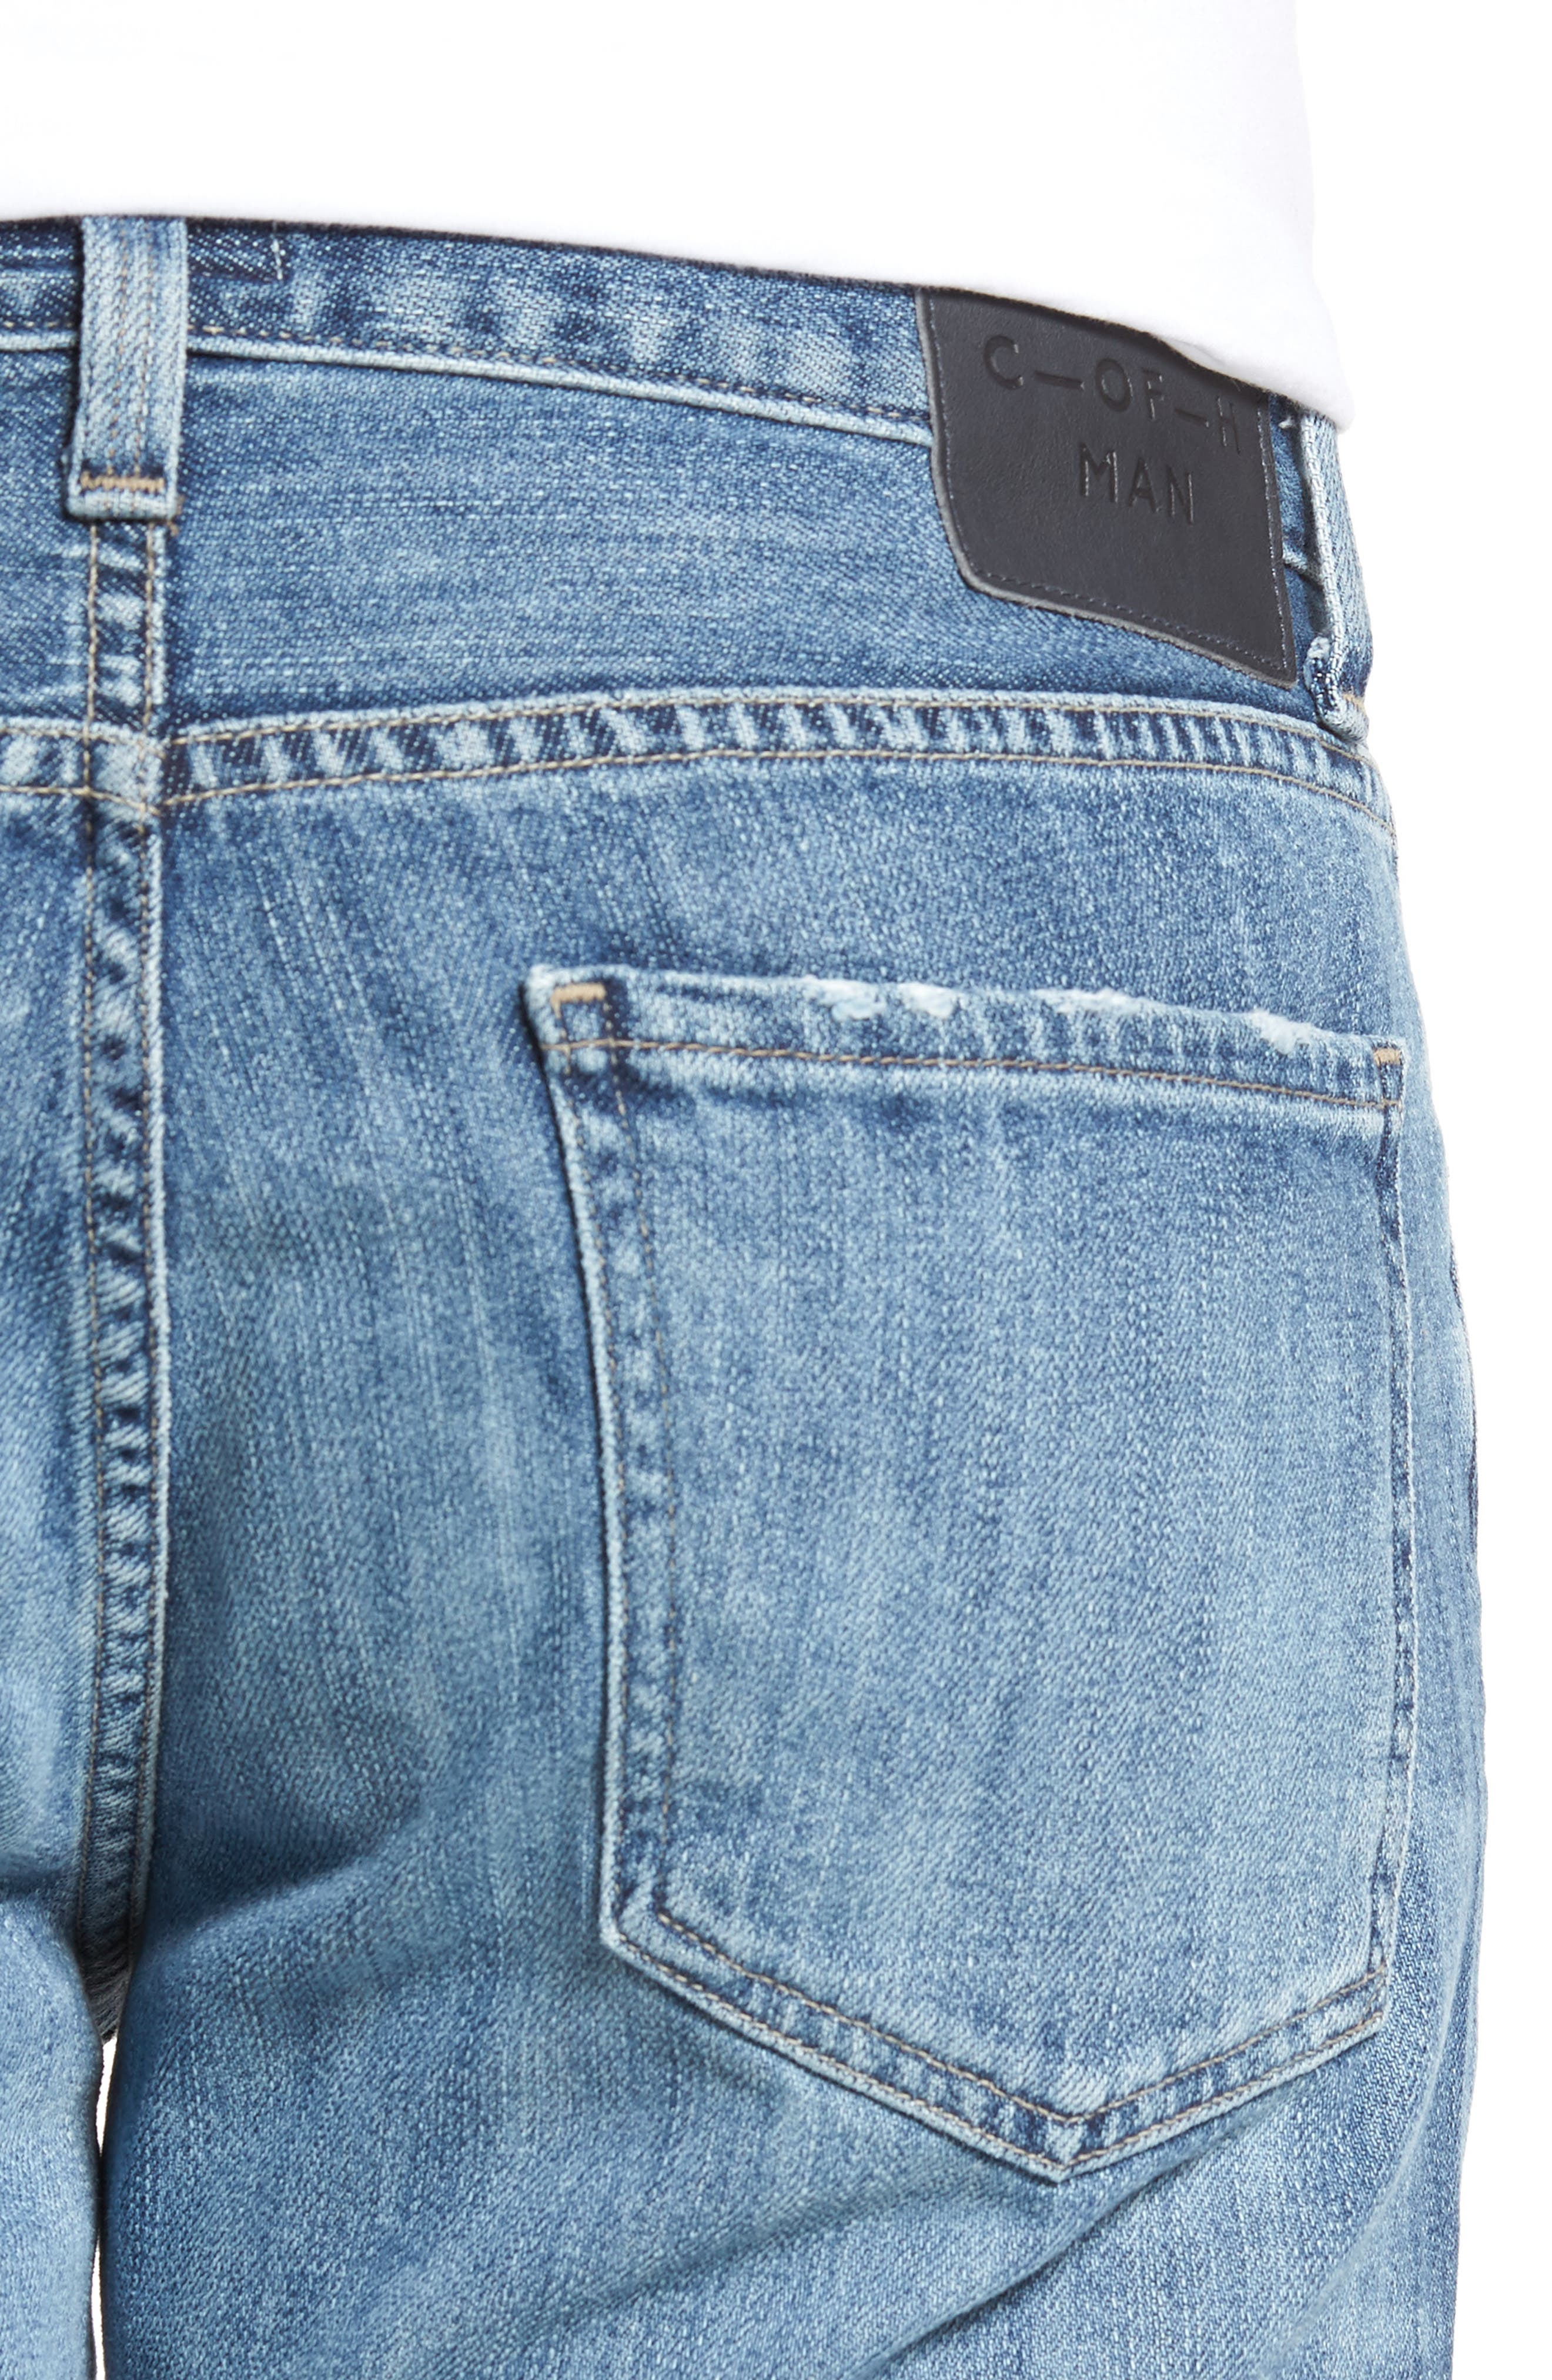 Bootcut Jeans,                             Alternate thumbnail 4, color,                             Colebrook